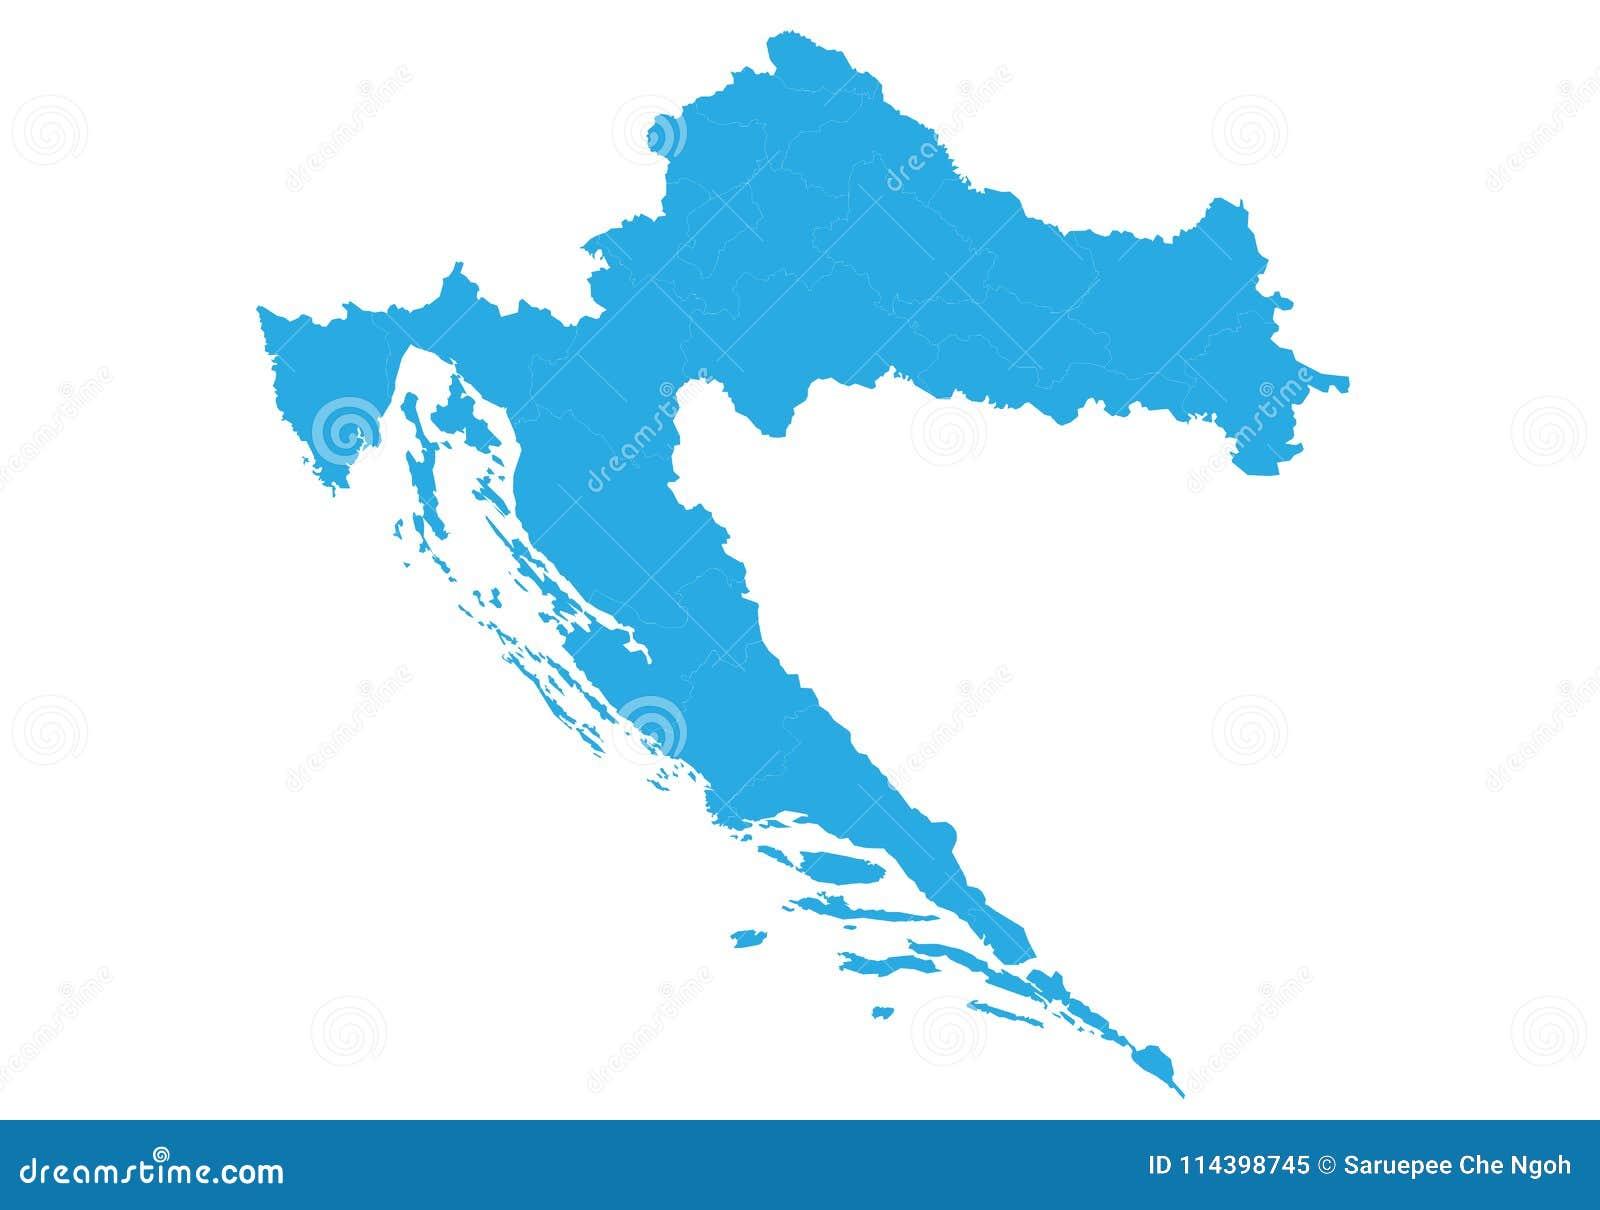 Map Of Croatia. High Detailed Vector Map - Croatia. Stock Vector ...